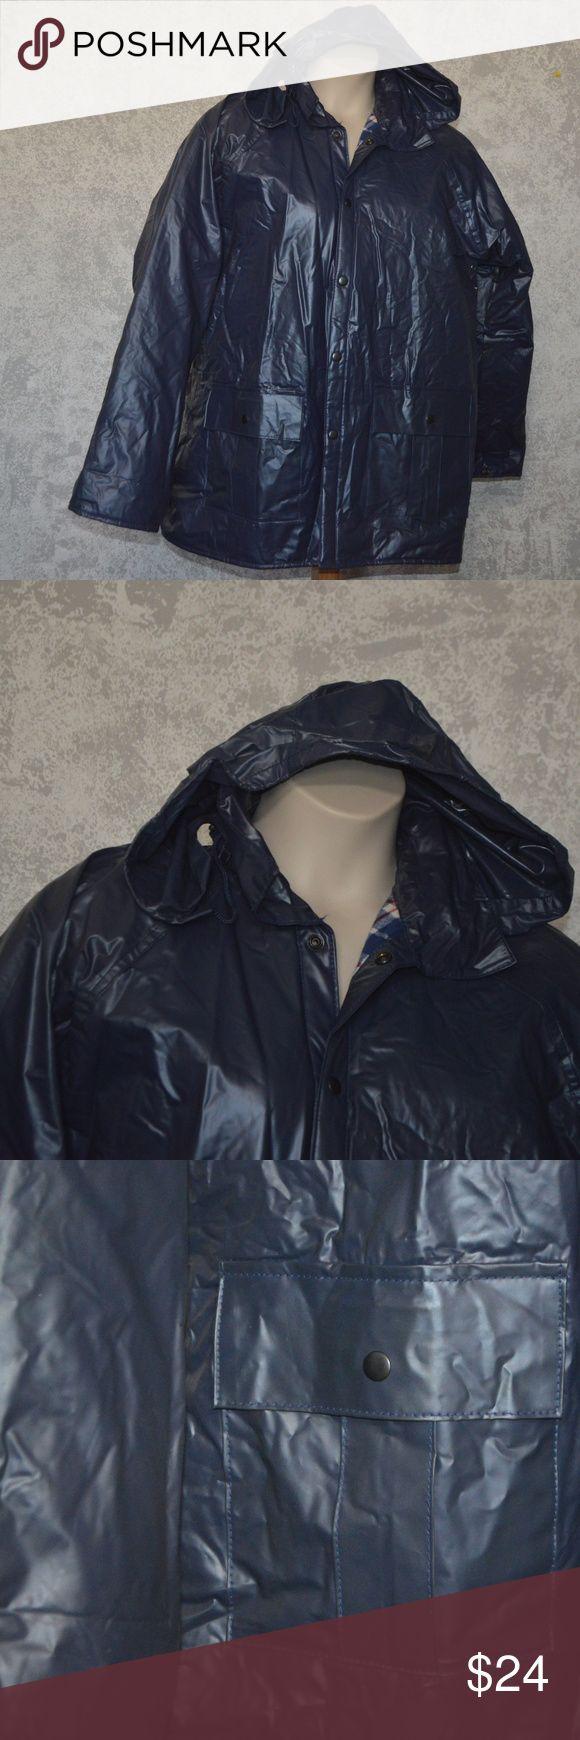 Duck bay flannel lined rain coat, outerwear mens L Comes